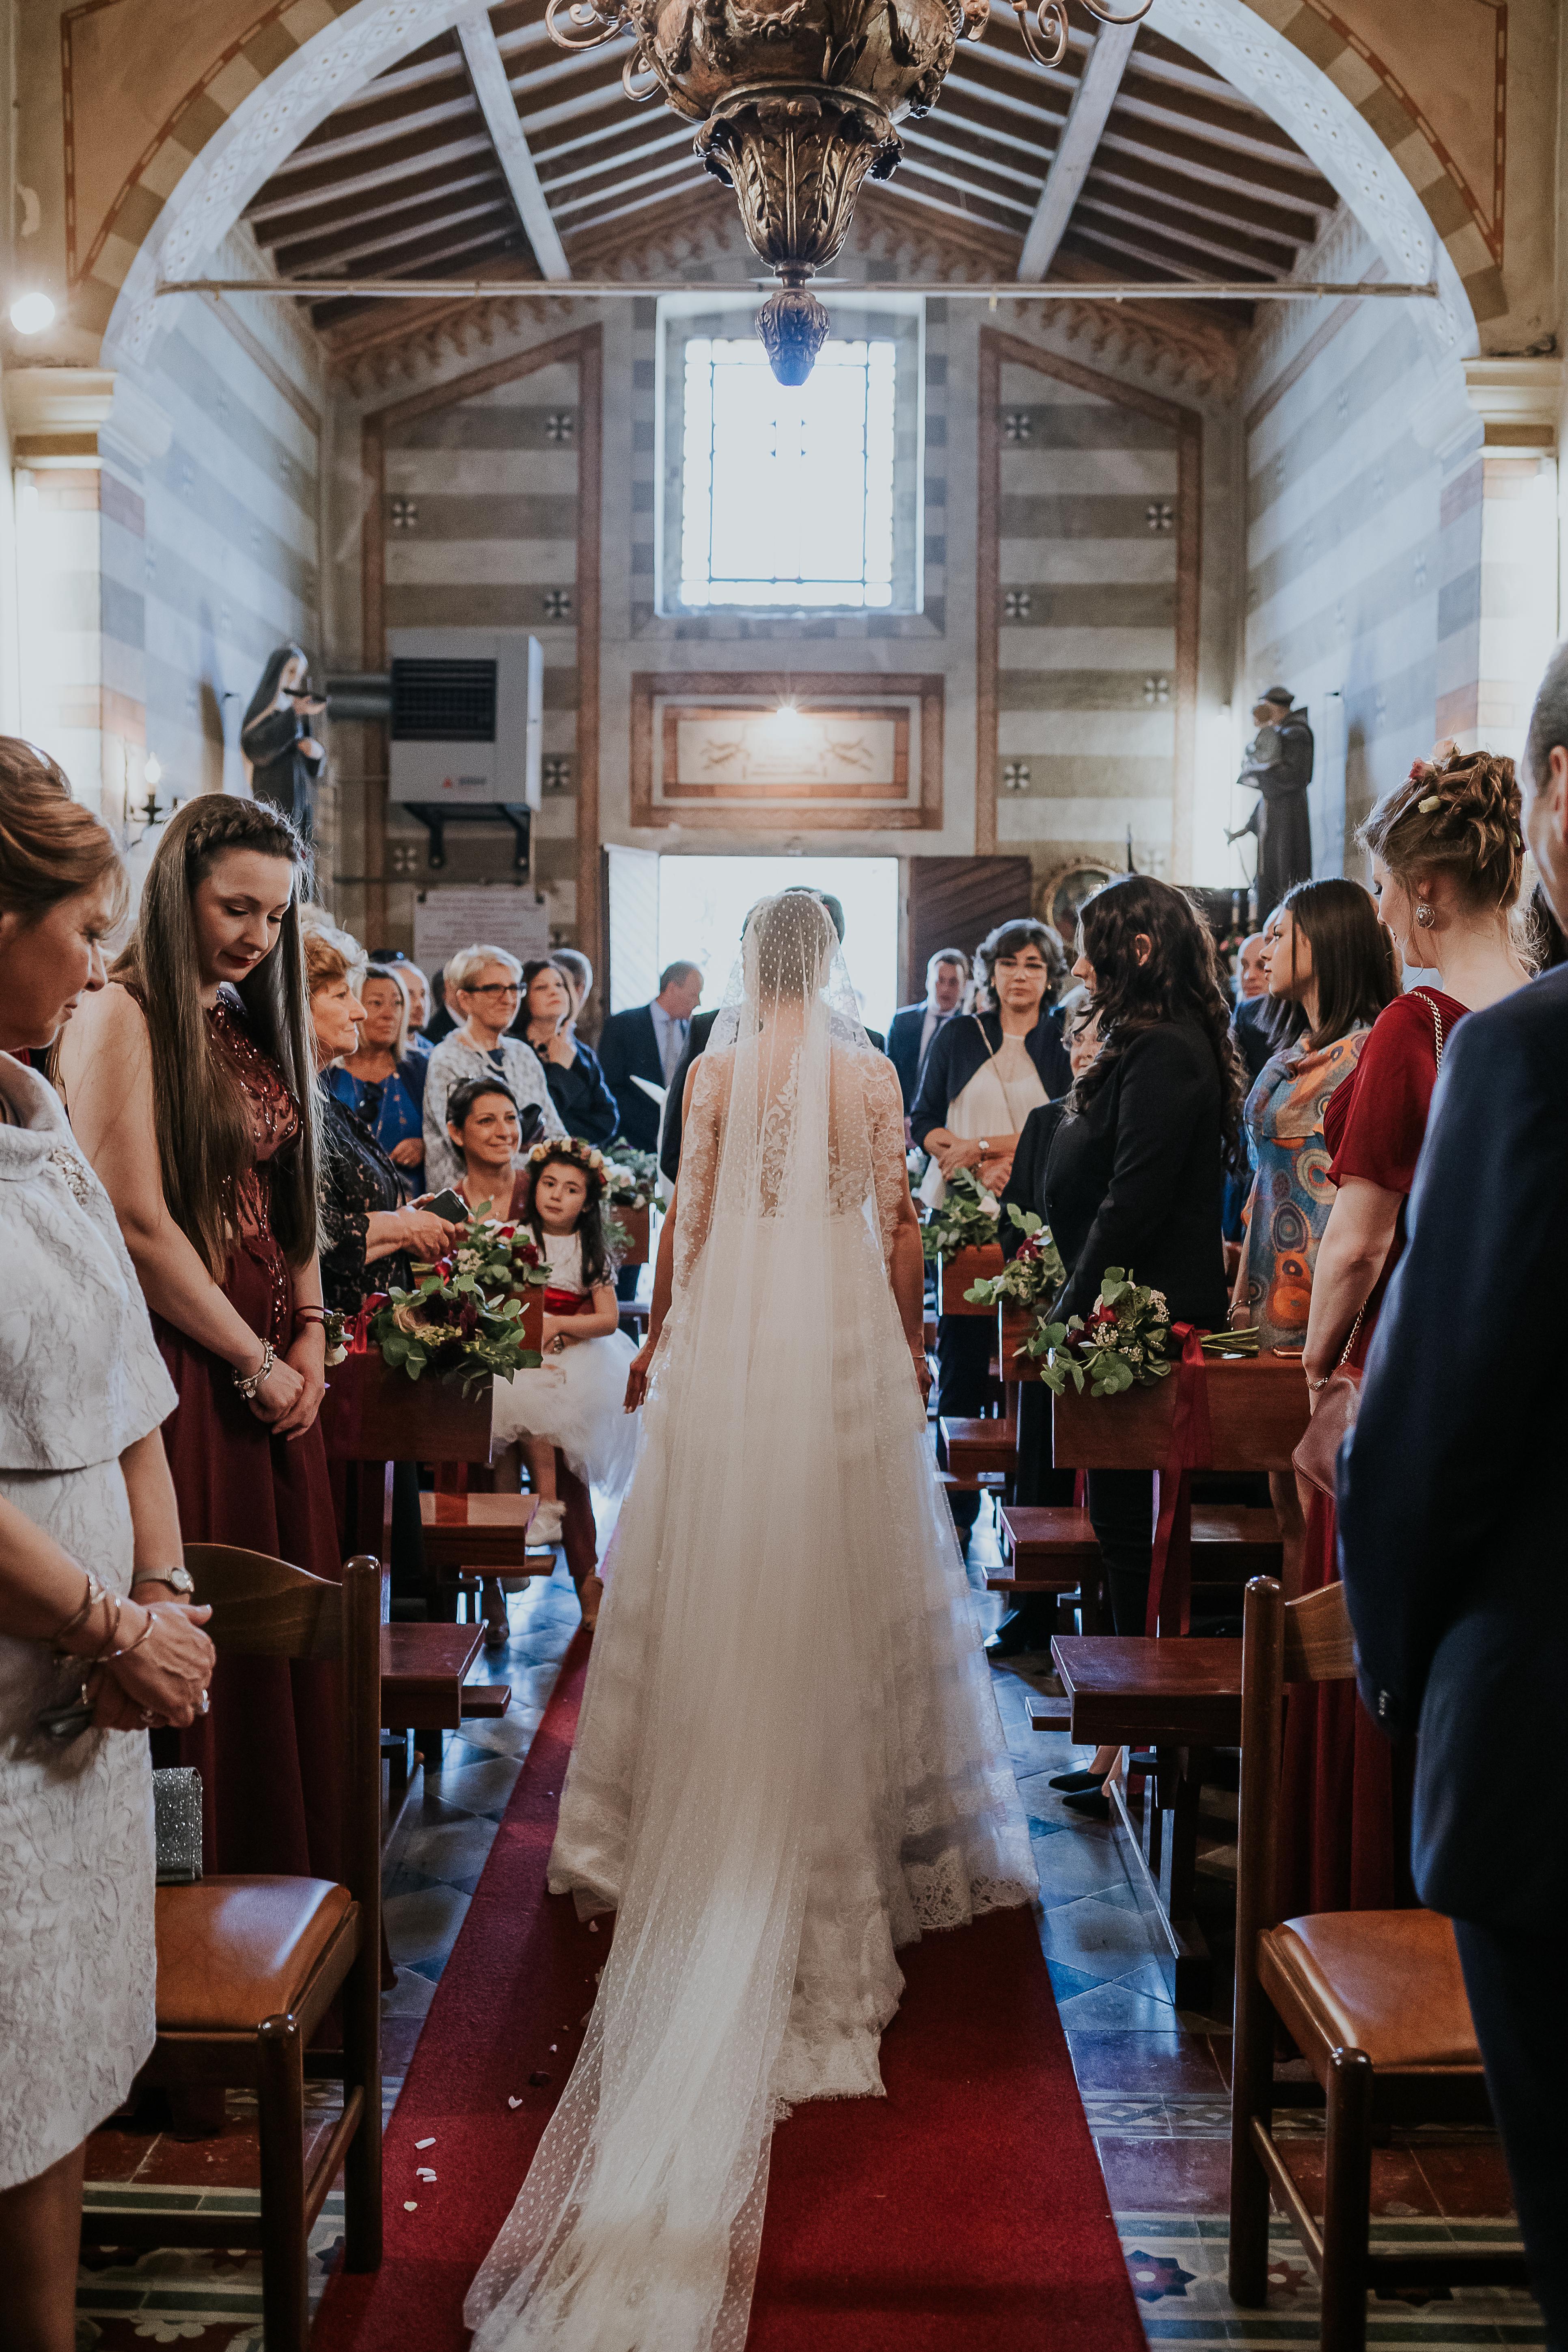 NicoleLaymanPhotography-20190504-Giovann